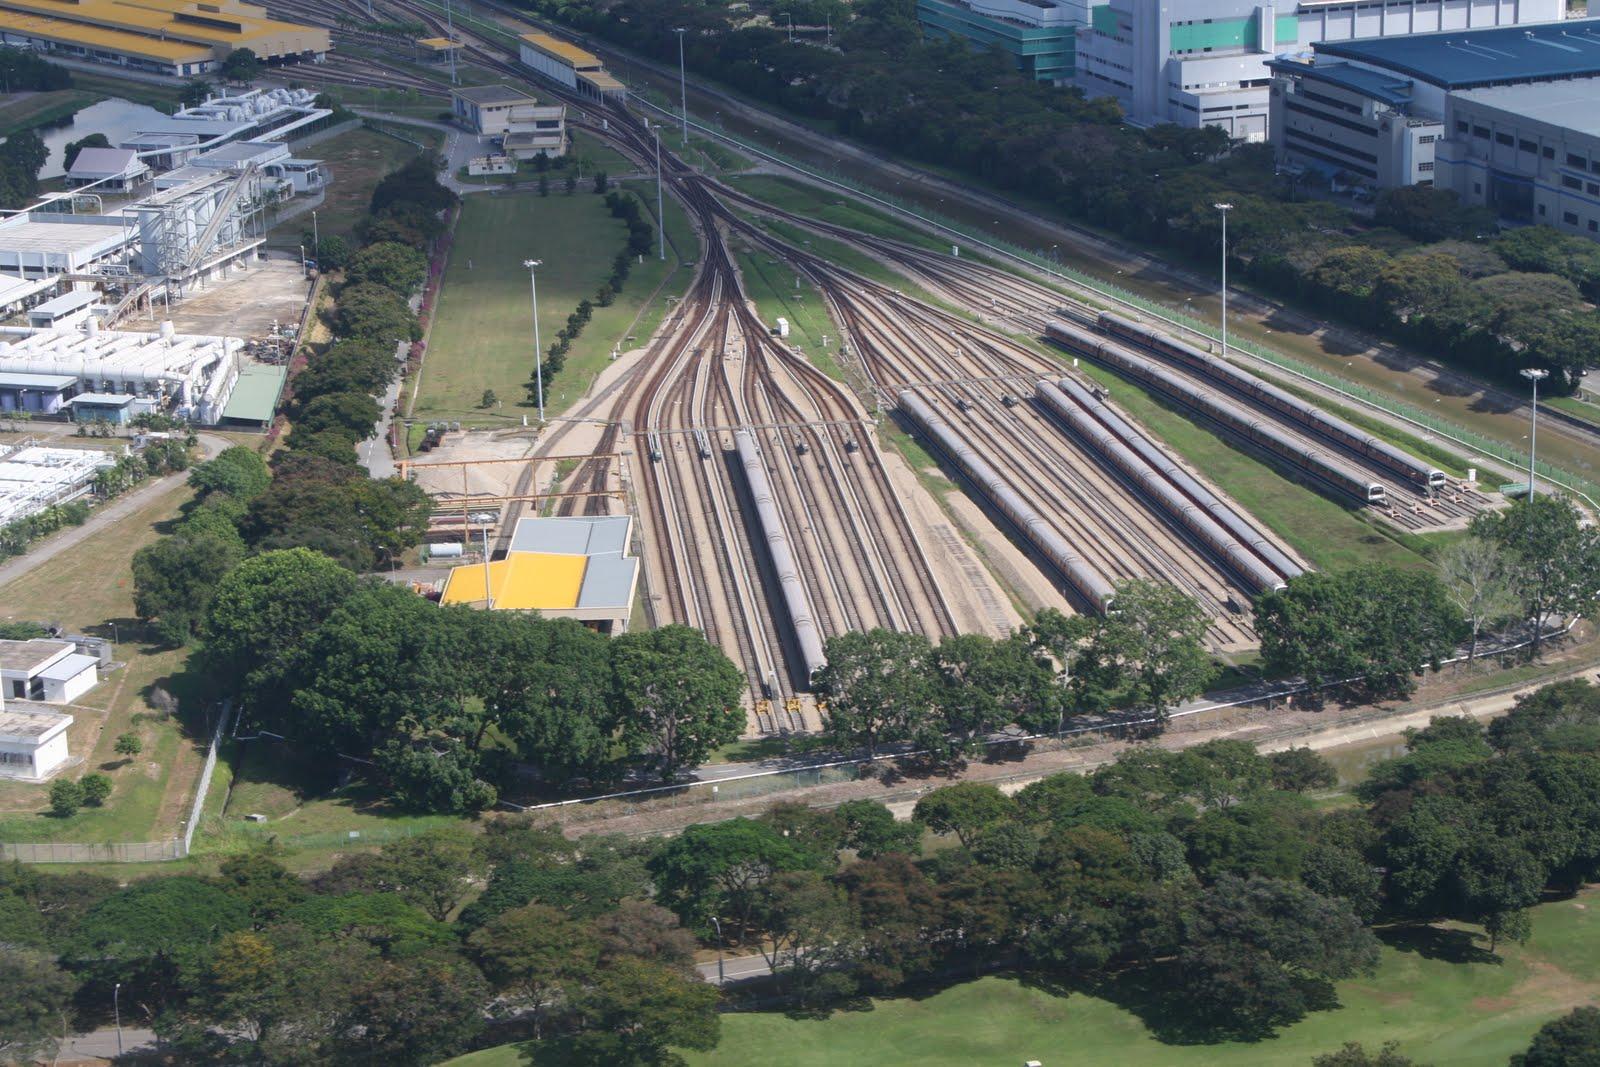 View of the Singapore Mass Rapid Transit (SMRT) depot in Tanah Merah ...